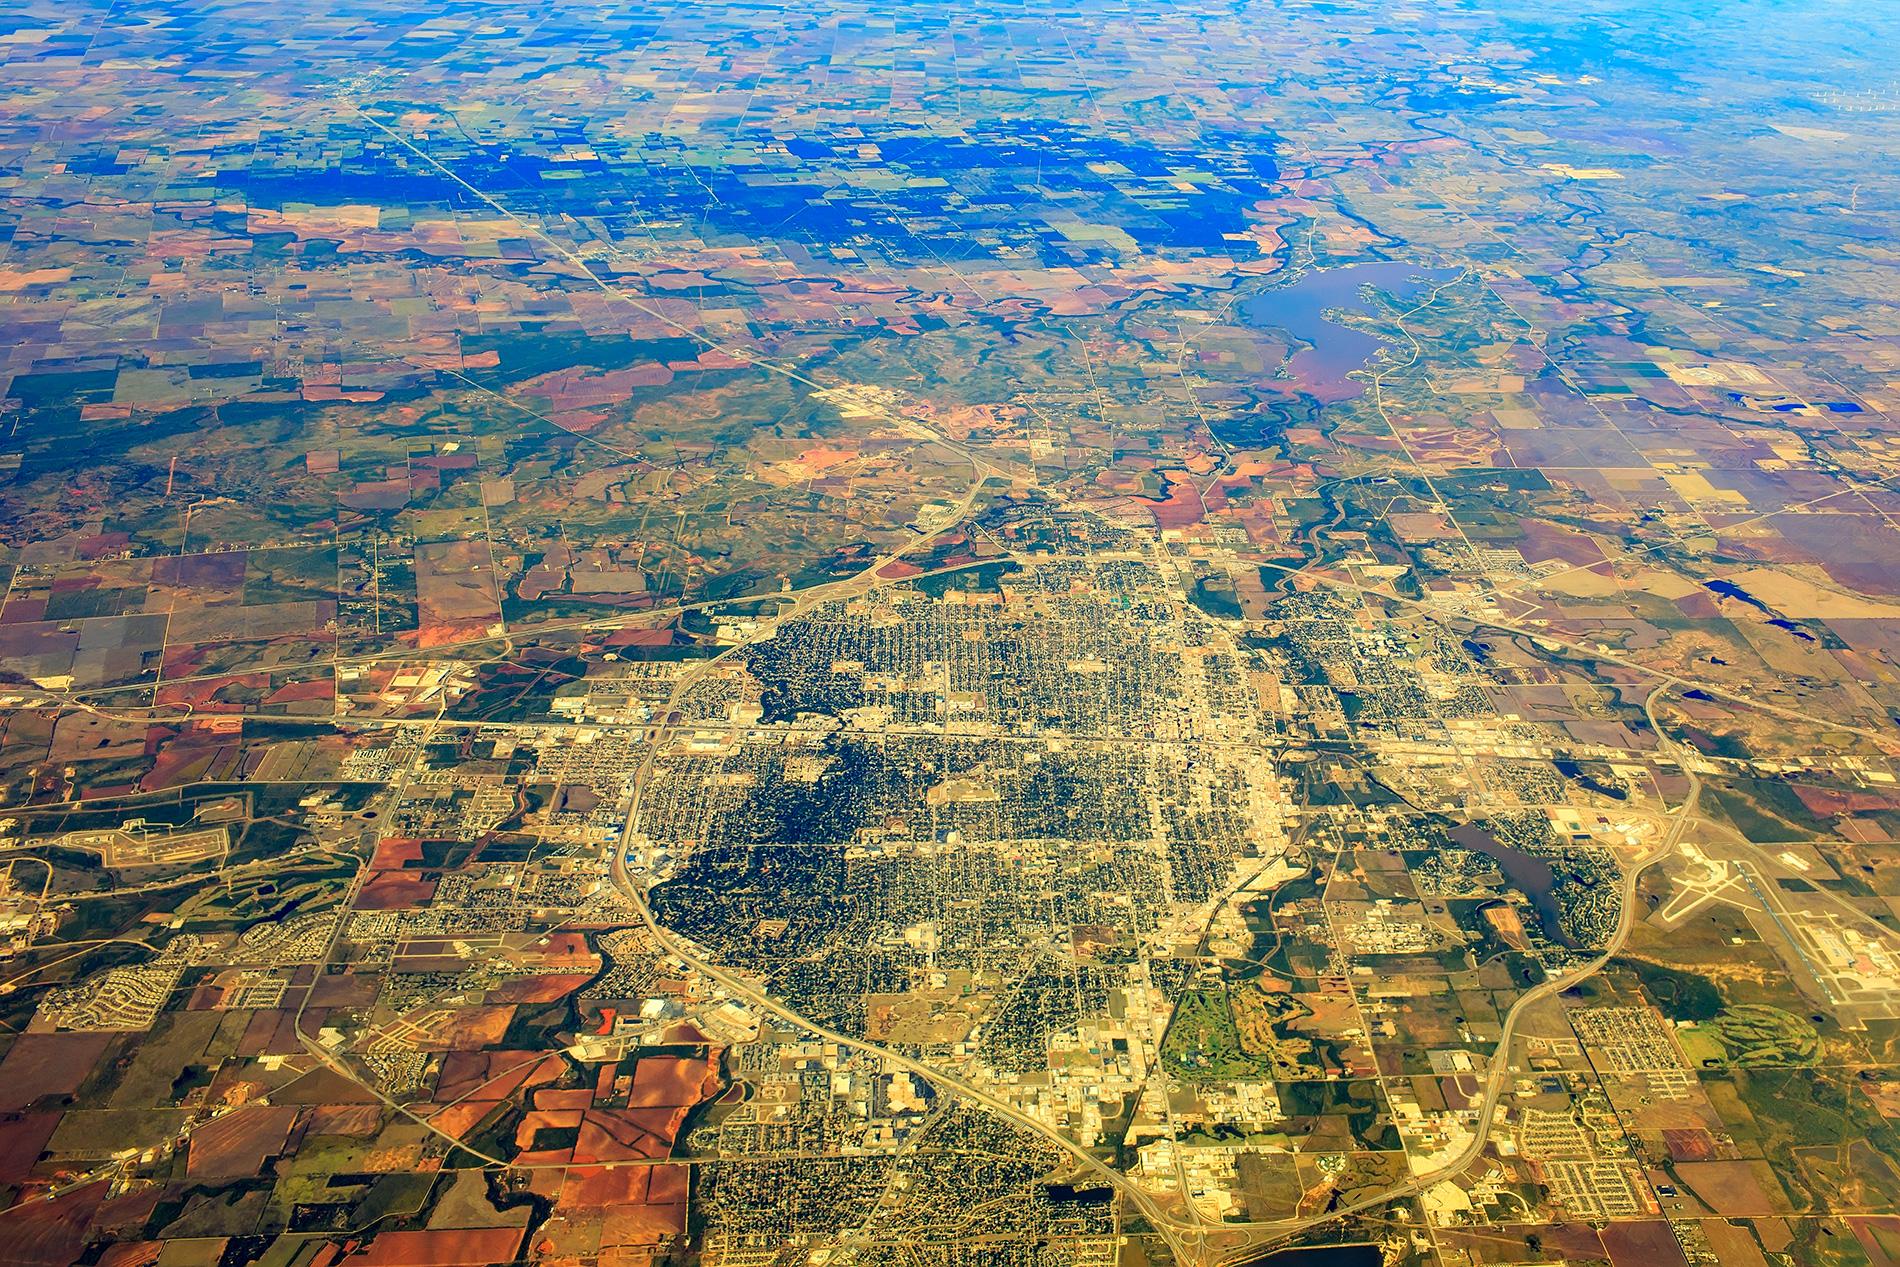 Aerial view of Wichita Falls Texas_Istock-494876232